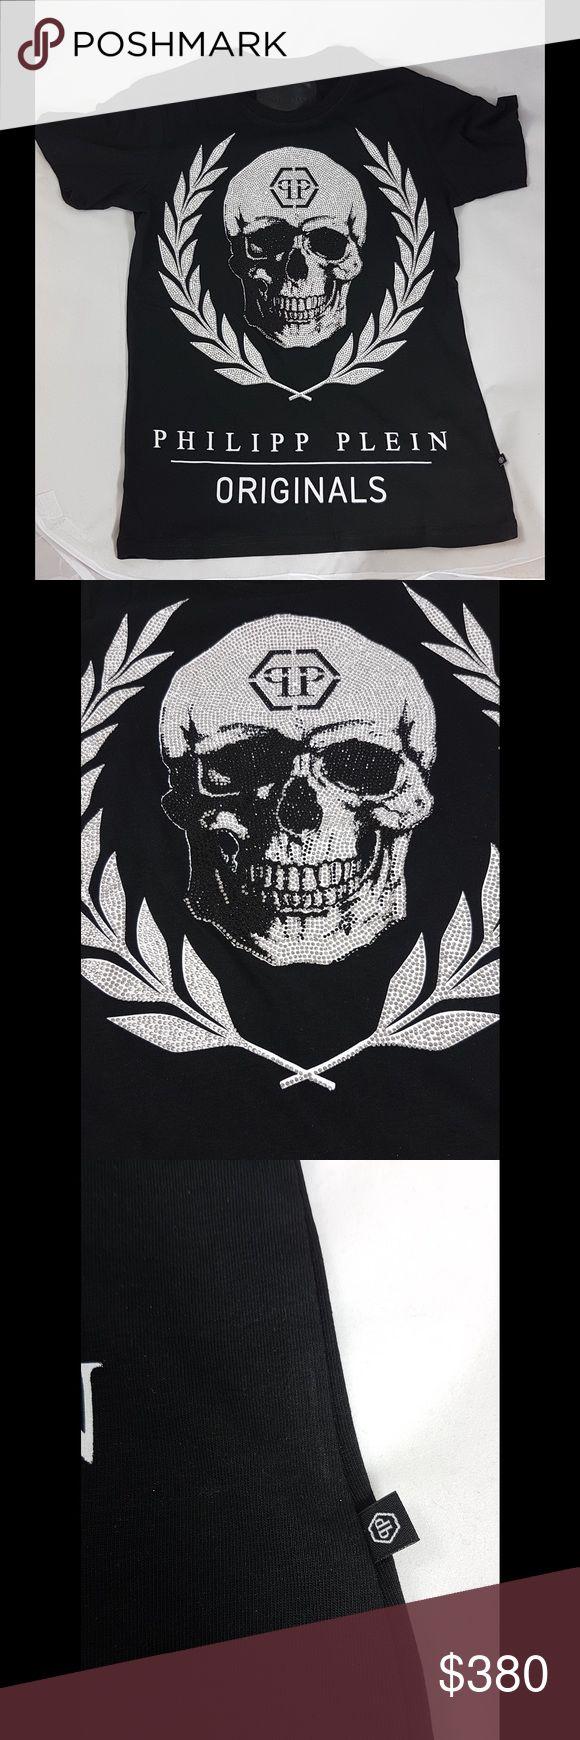 Black keys t shirt uk - Philipp Plein T Shirt Bone Model